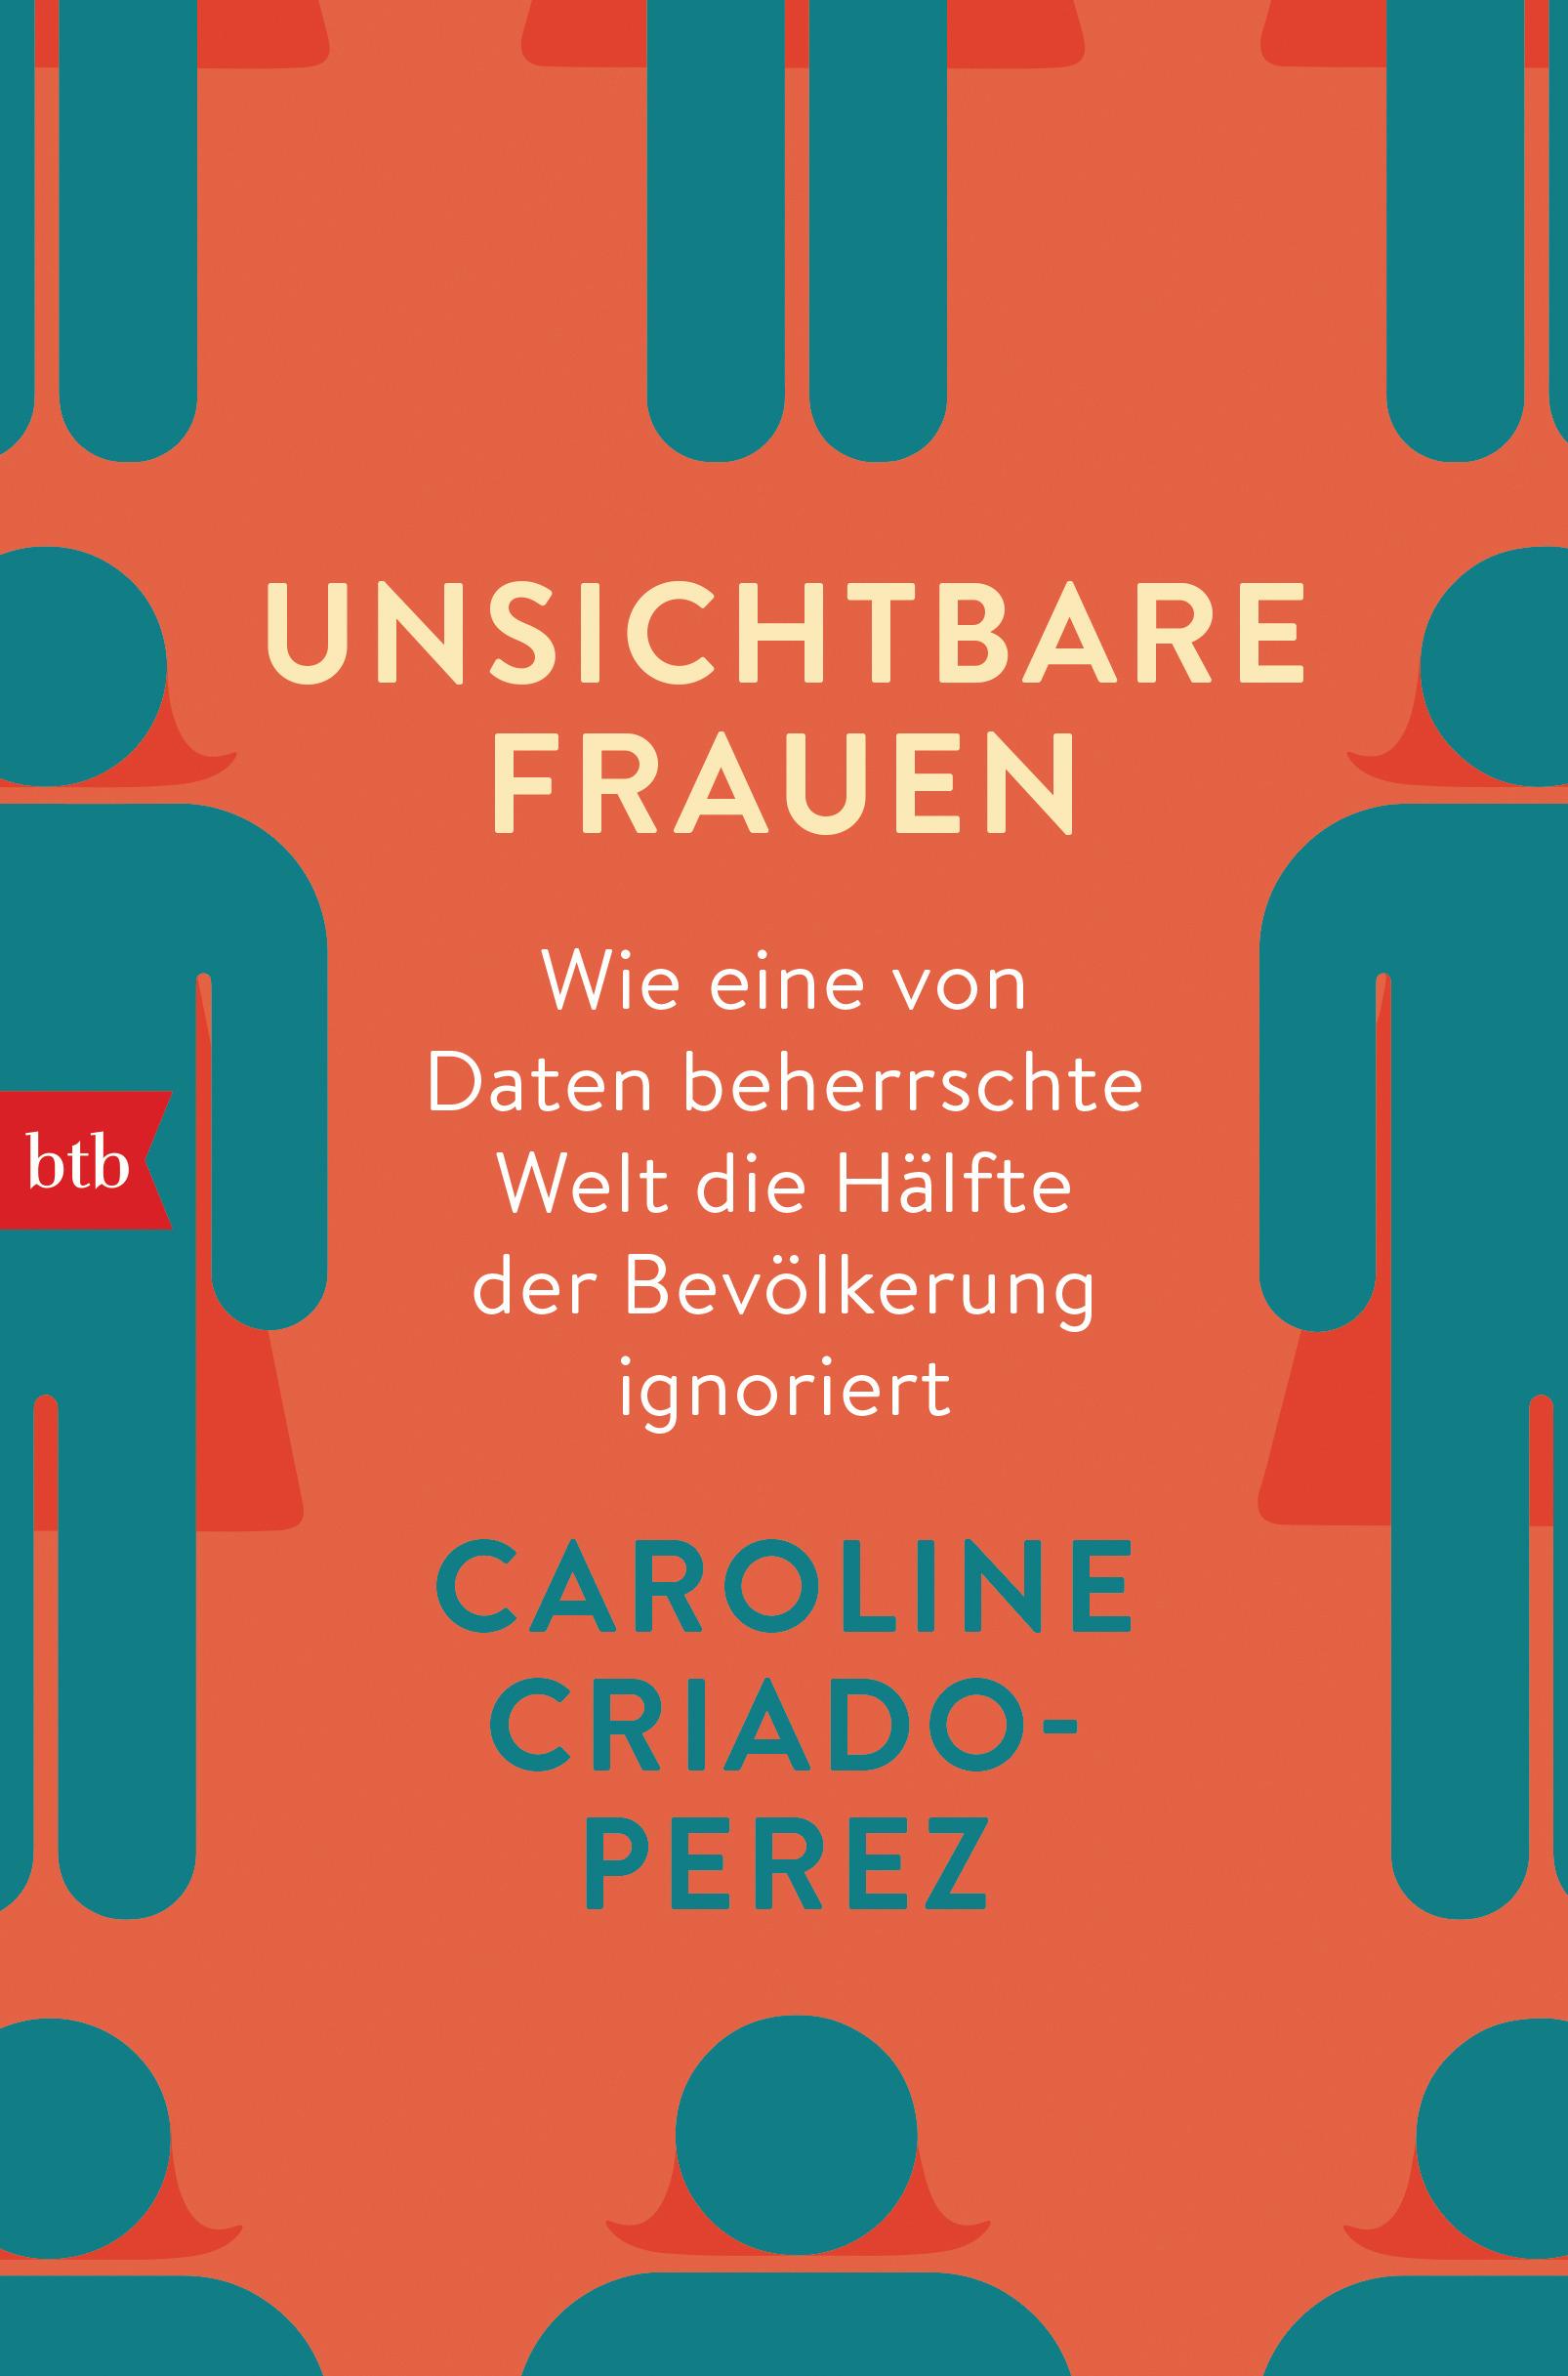 Unsichtbare Frauen // Caroline Criado-Perez